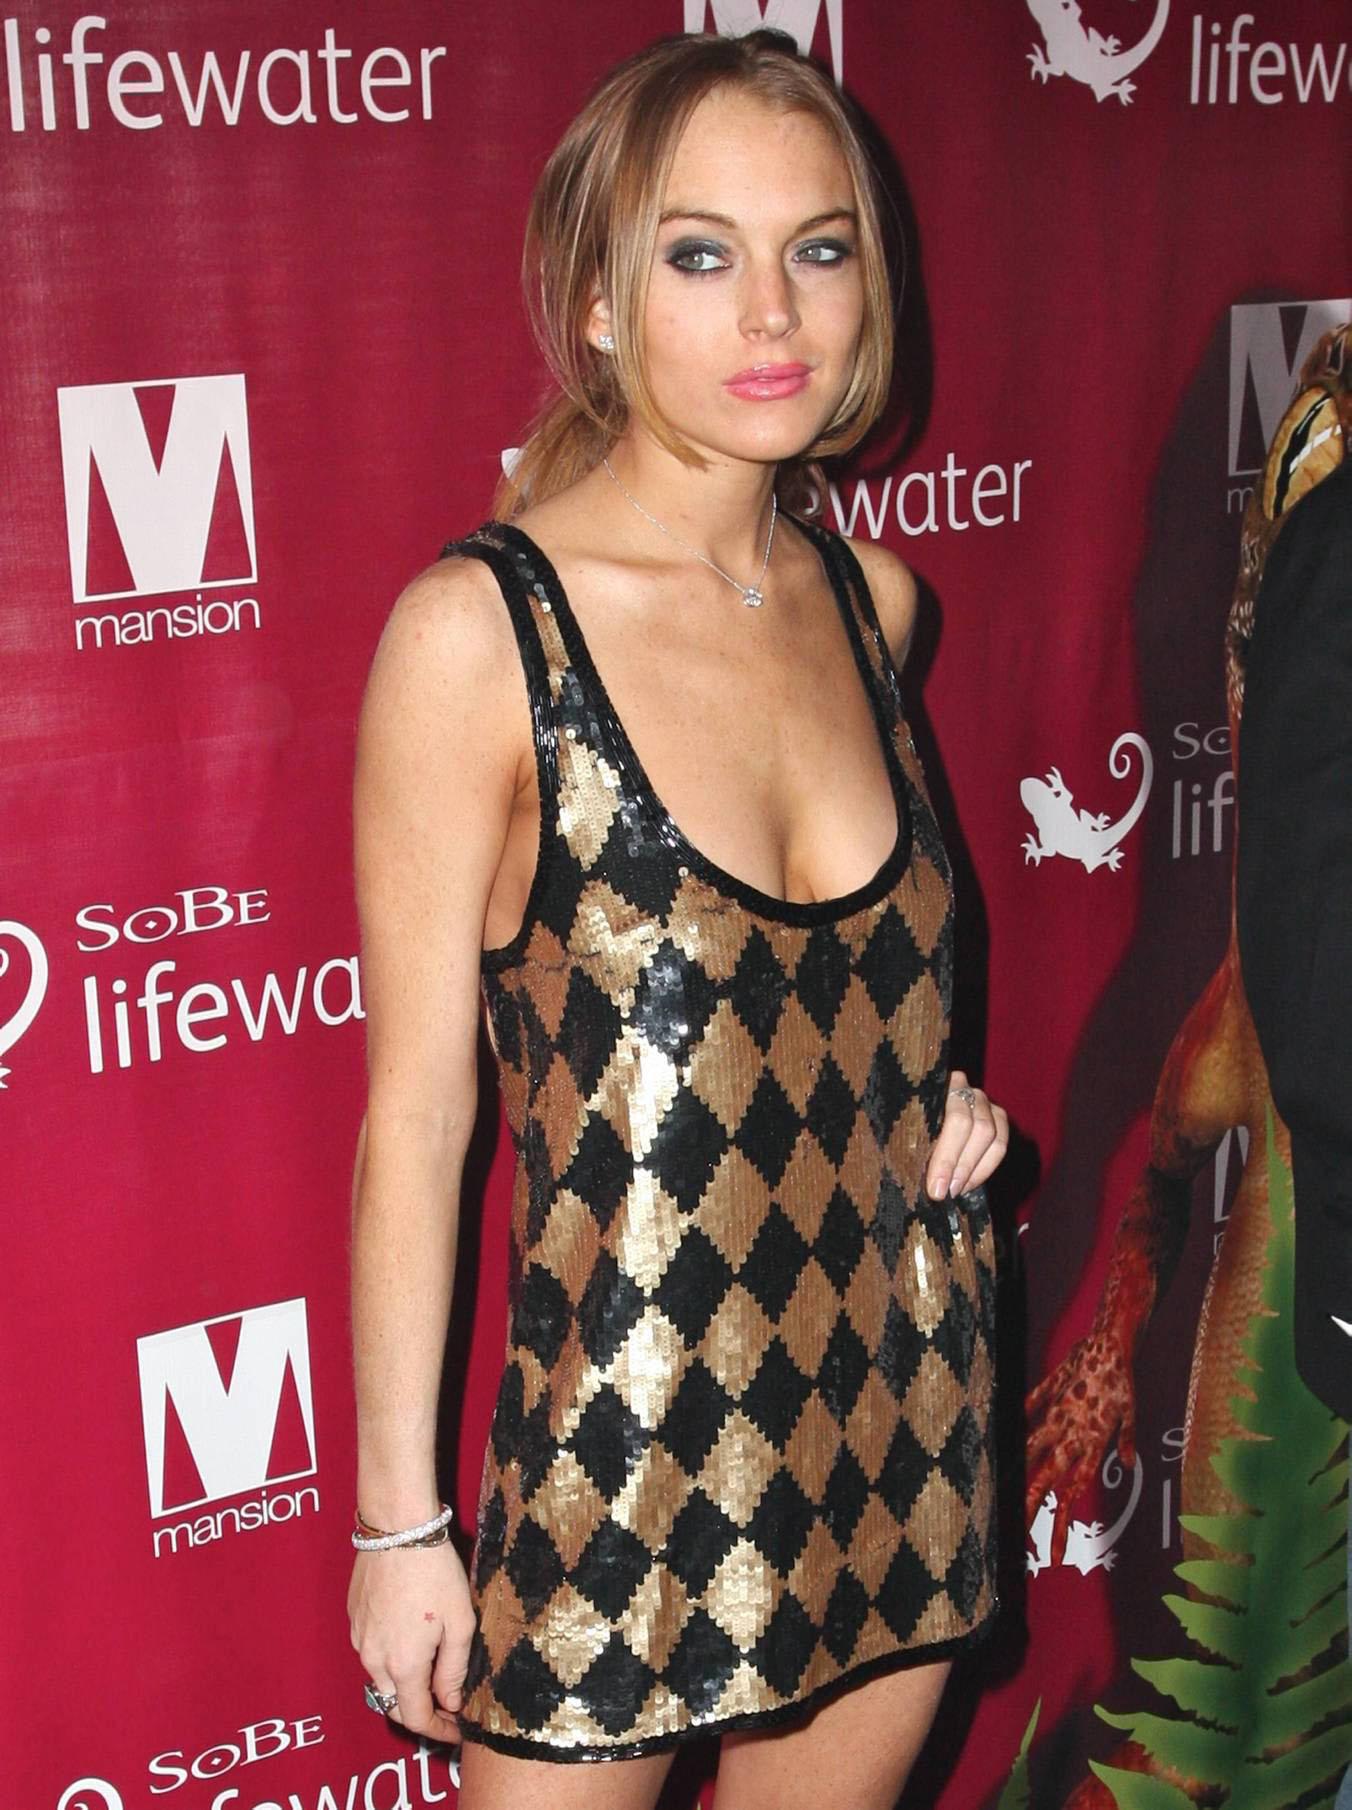 37996_Lindsay_Lohan_at_Mansion_Nightclub_in_Miami_1-1-2009_004_122_159lo.jpg